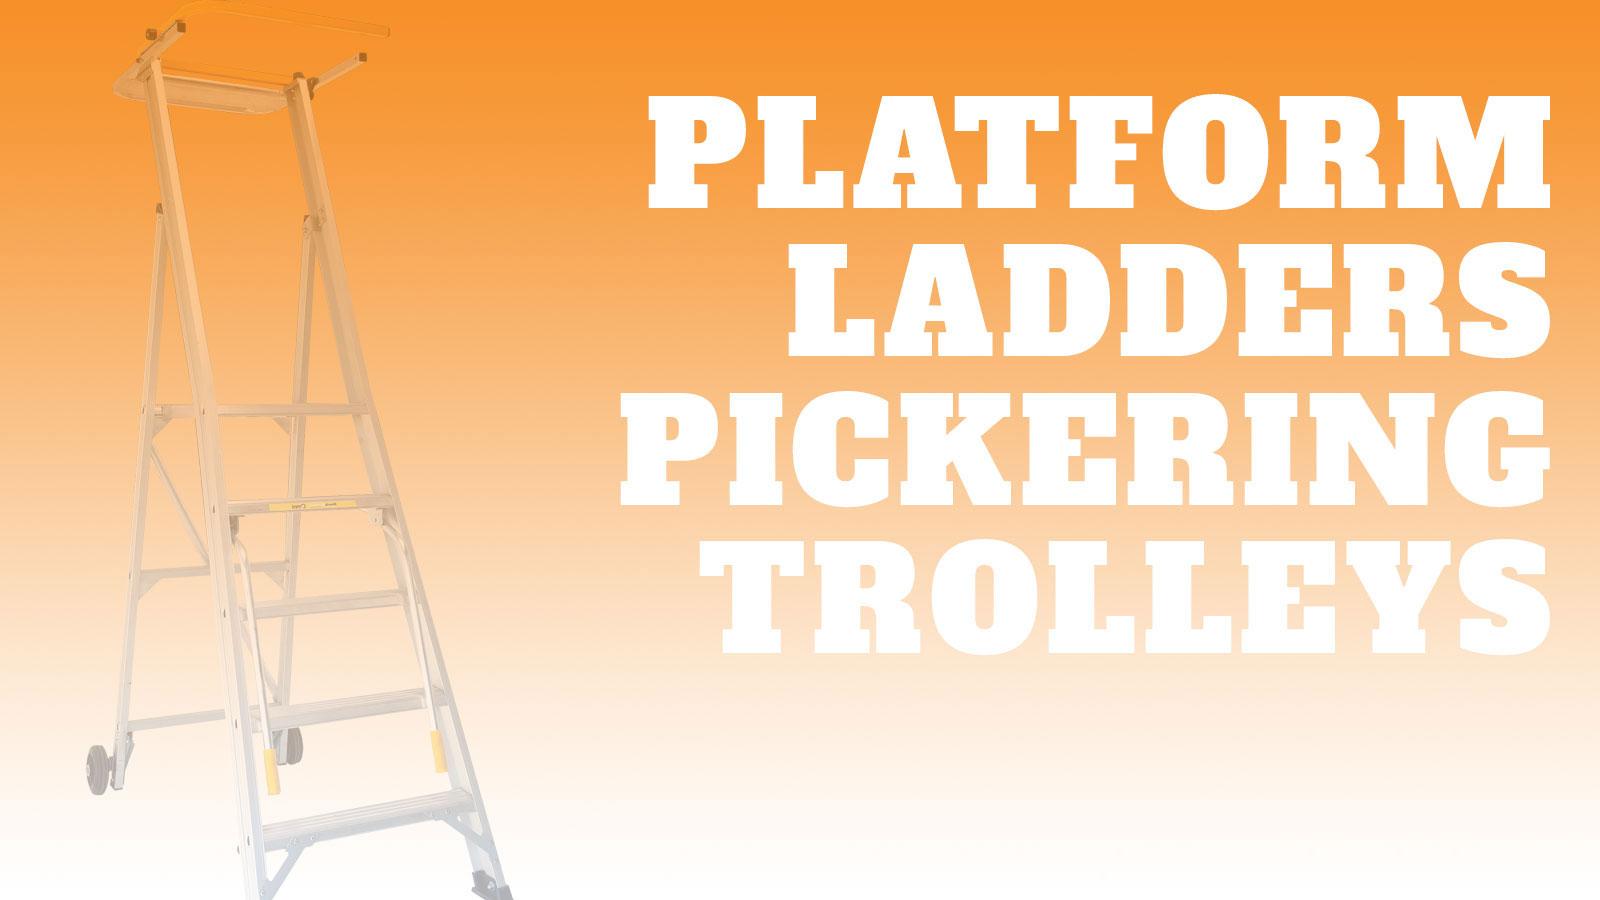 Industrial-Platform-Ladders-Pickering